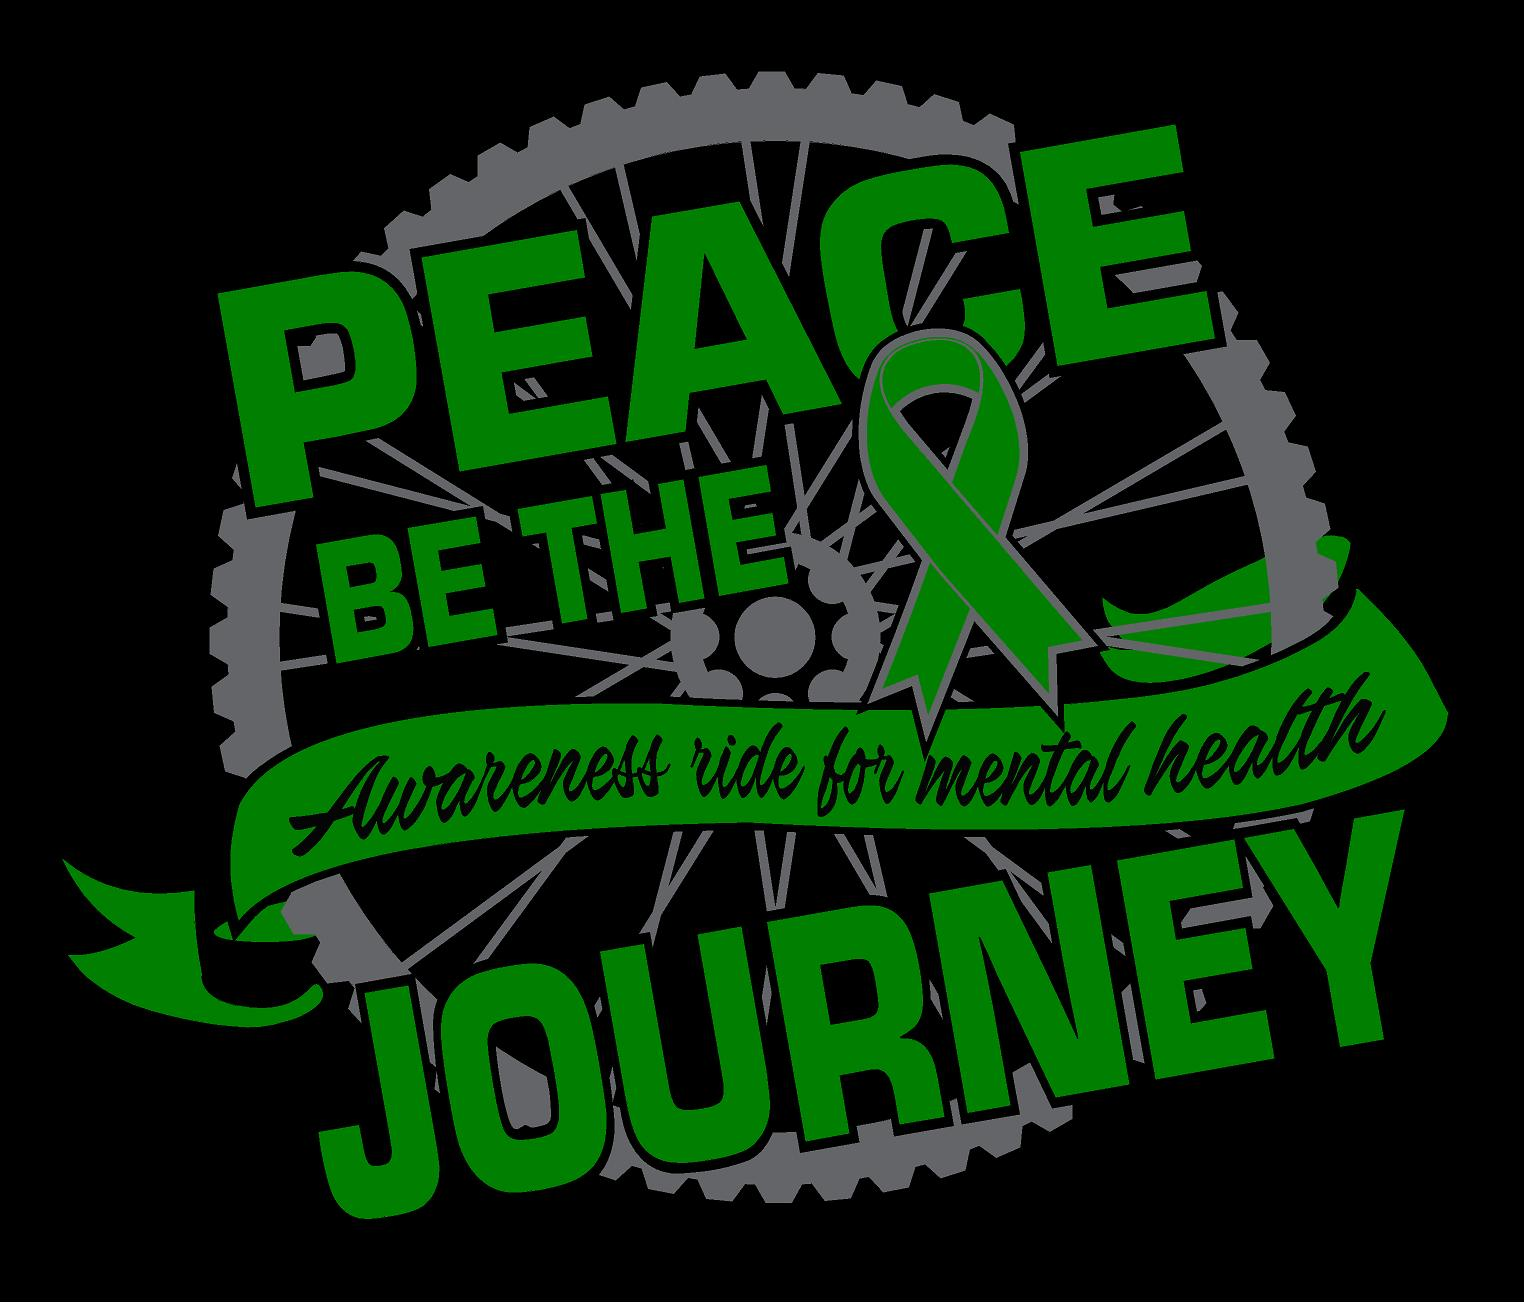 Peace be the Journey - logo.jpg